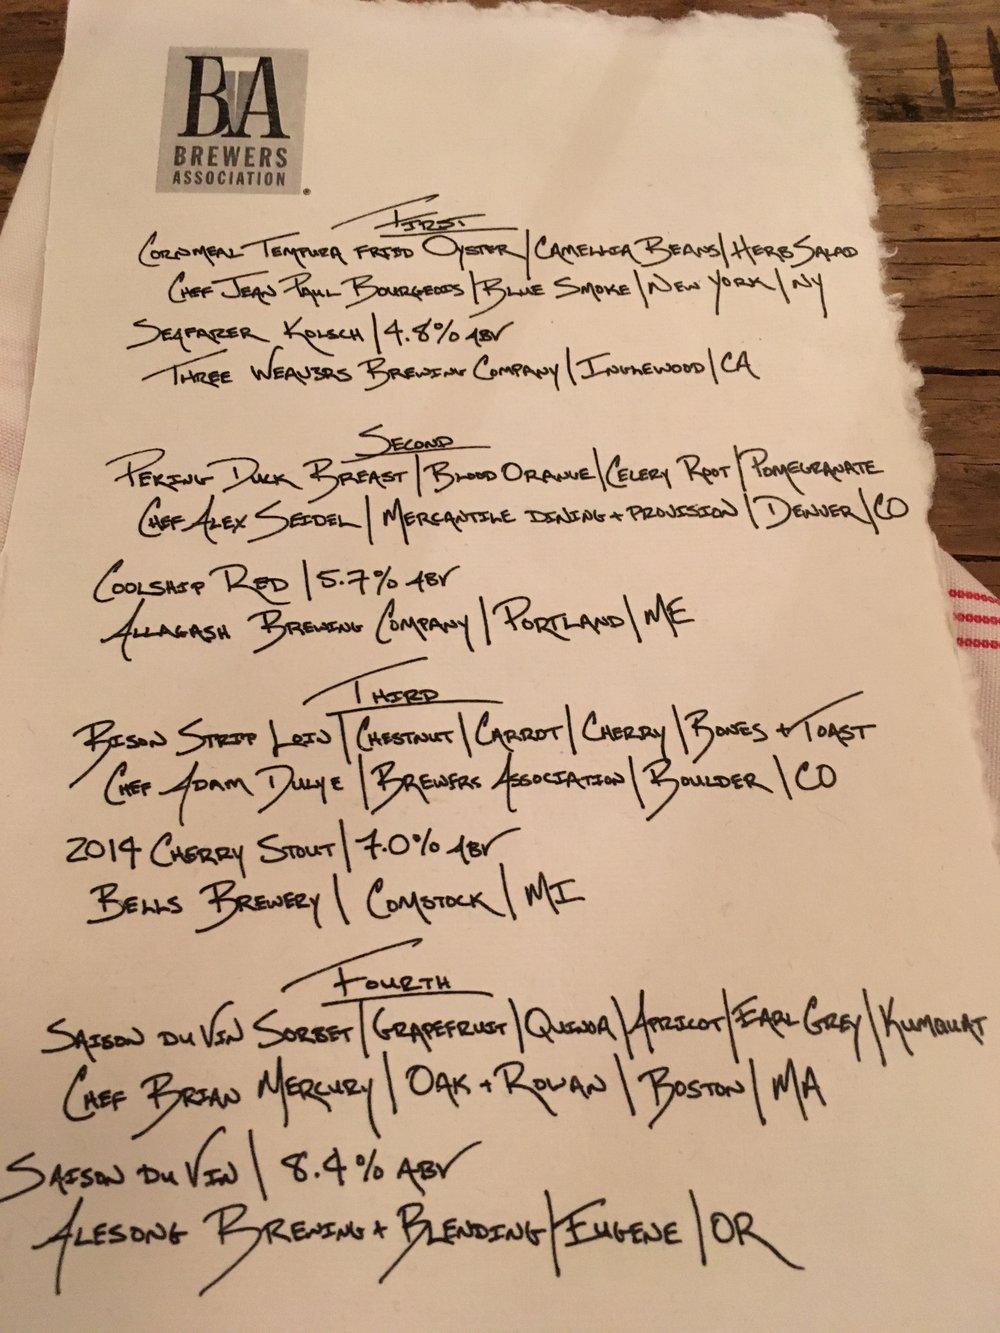 What a menu!